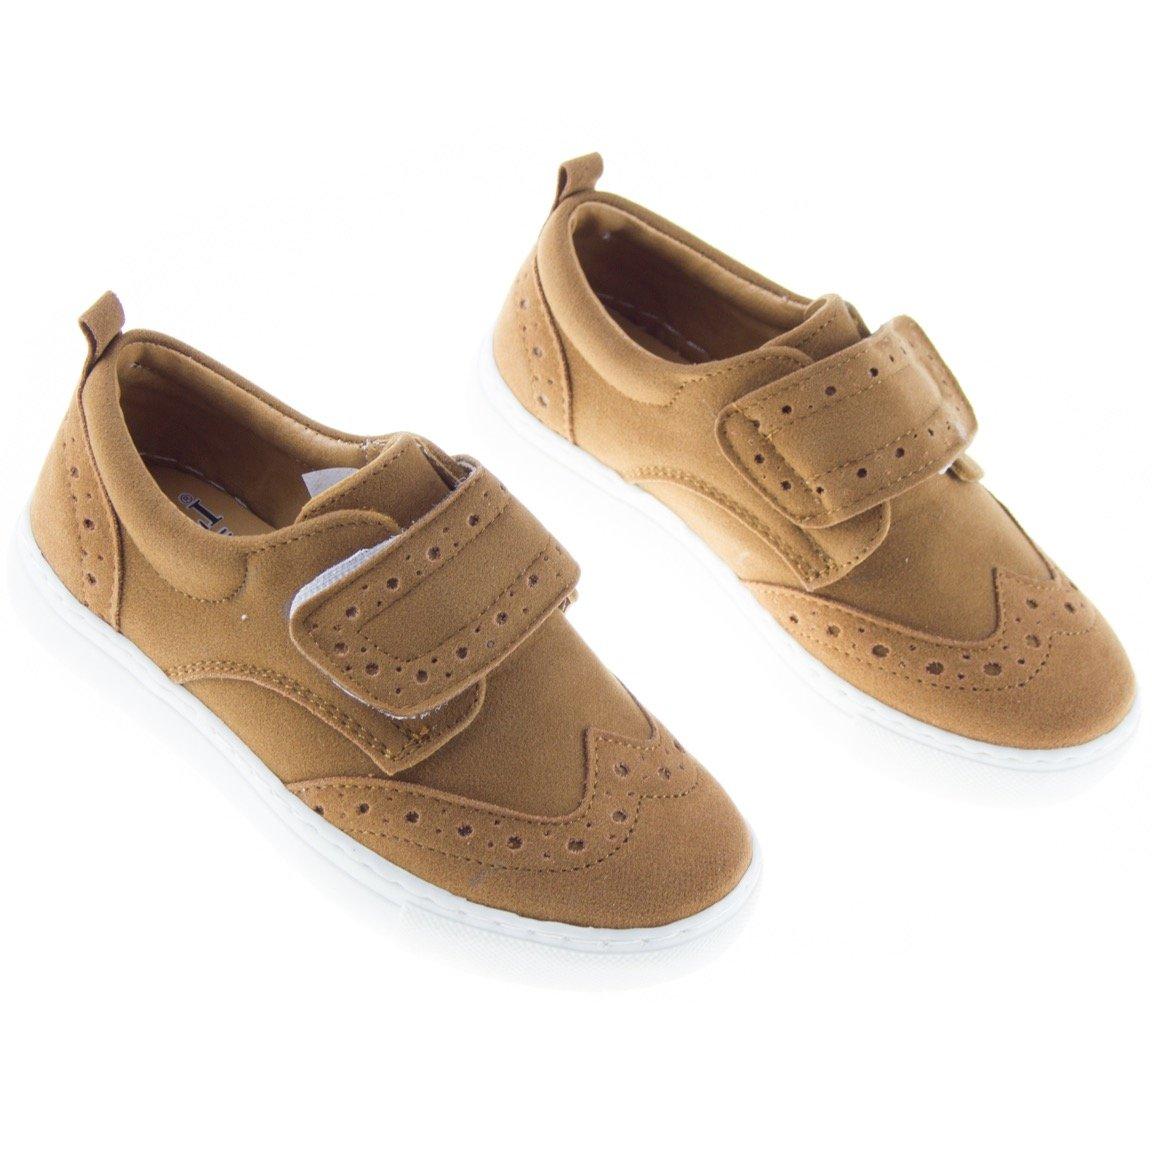 Harli By Sen παιδικά παπούτσια «Suave»